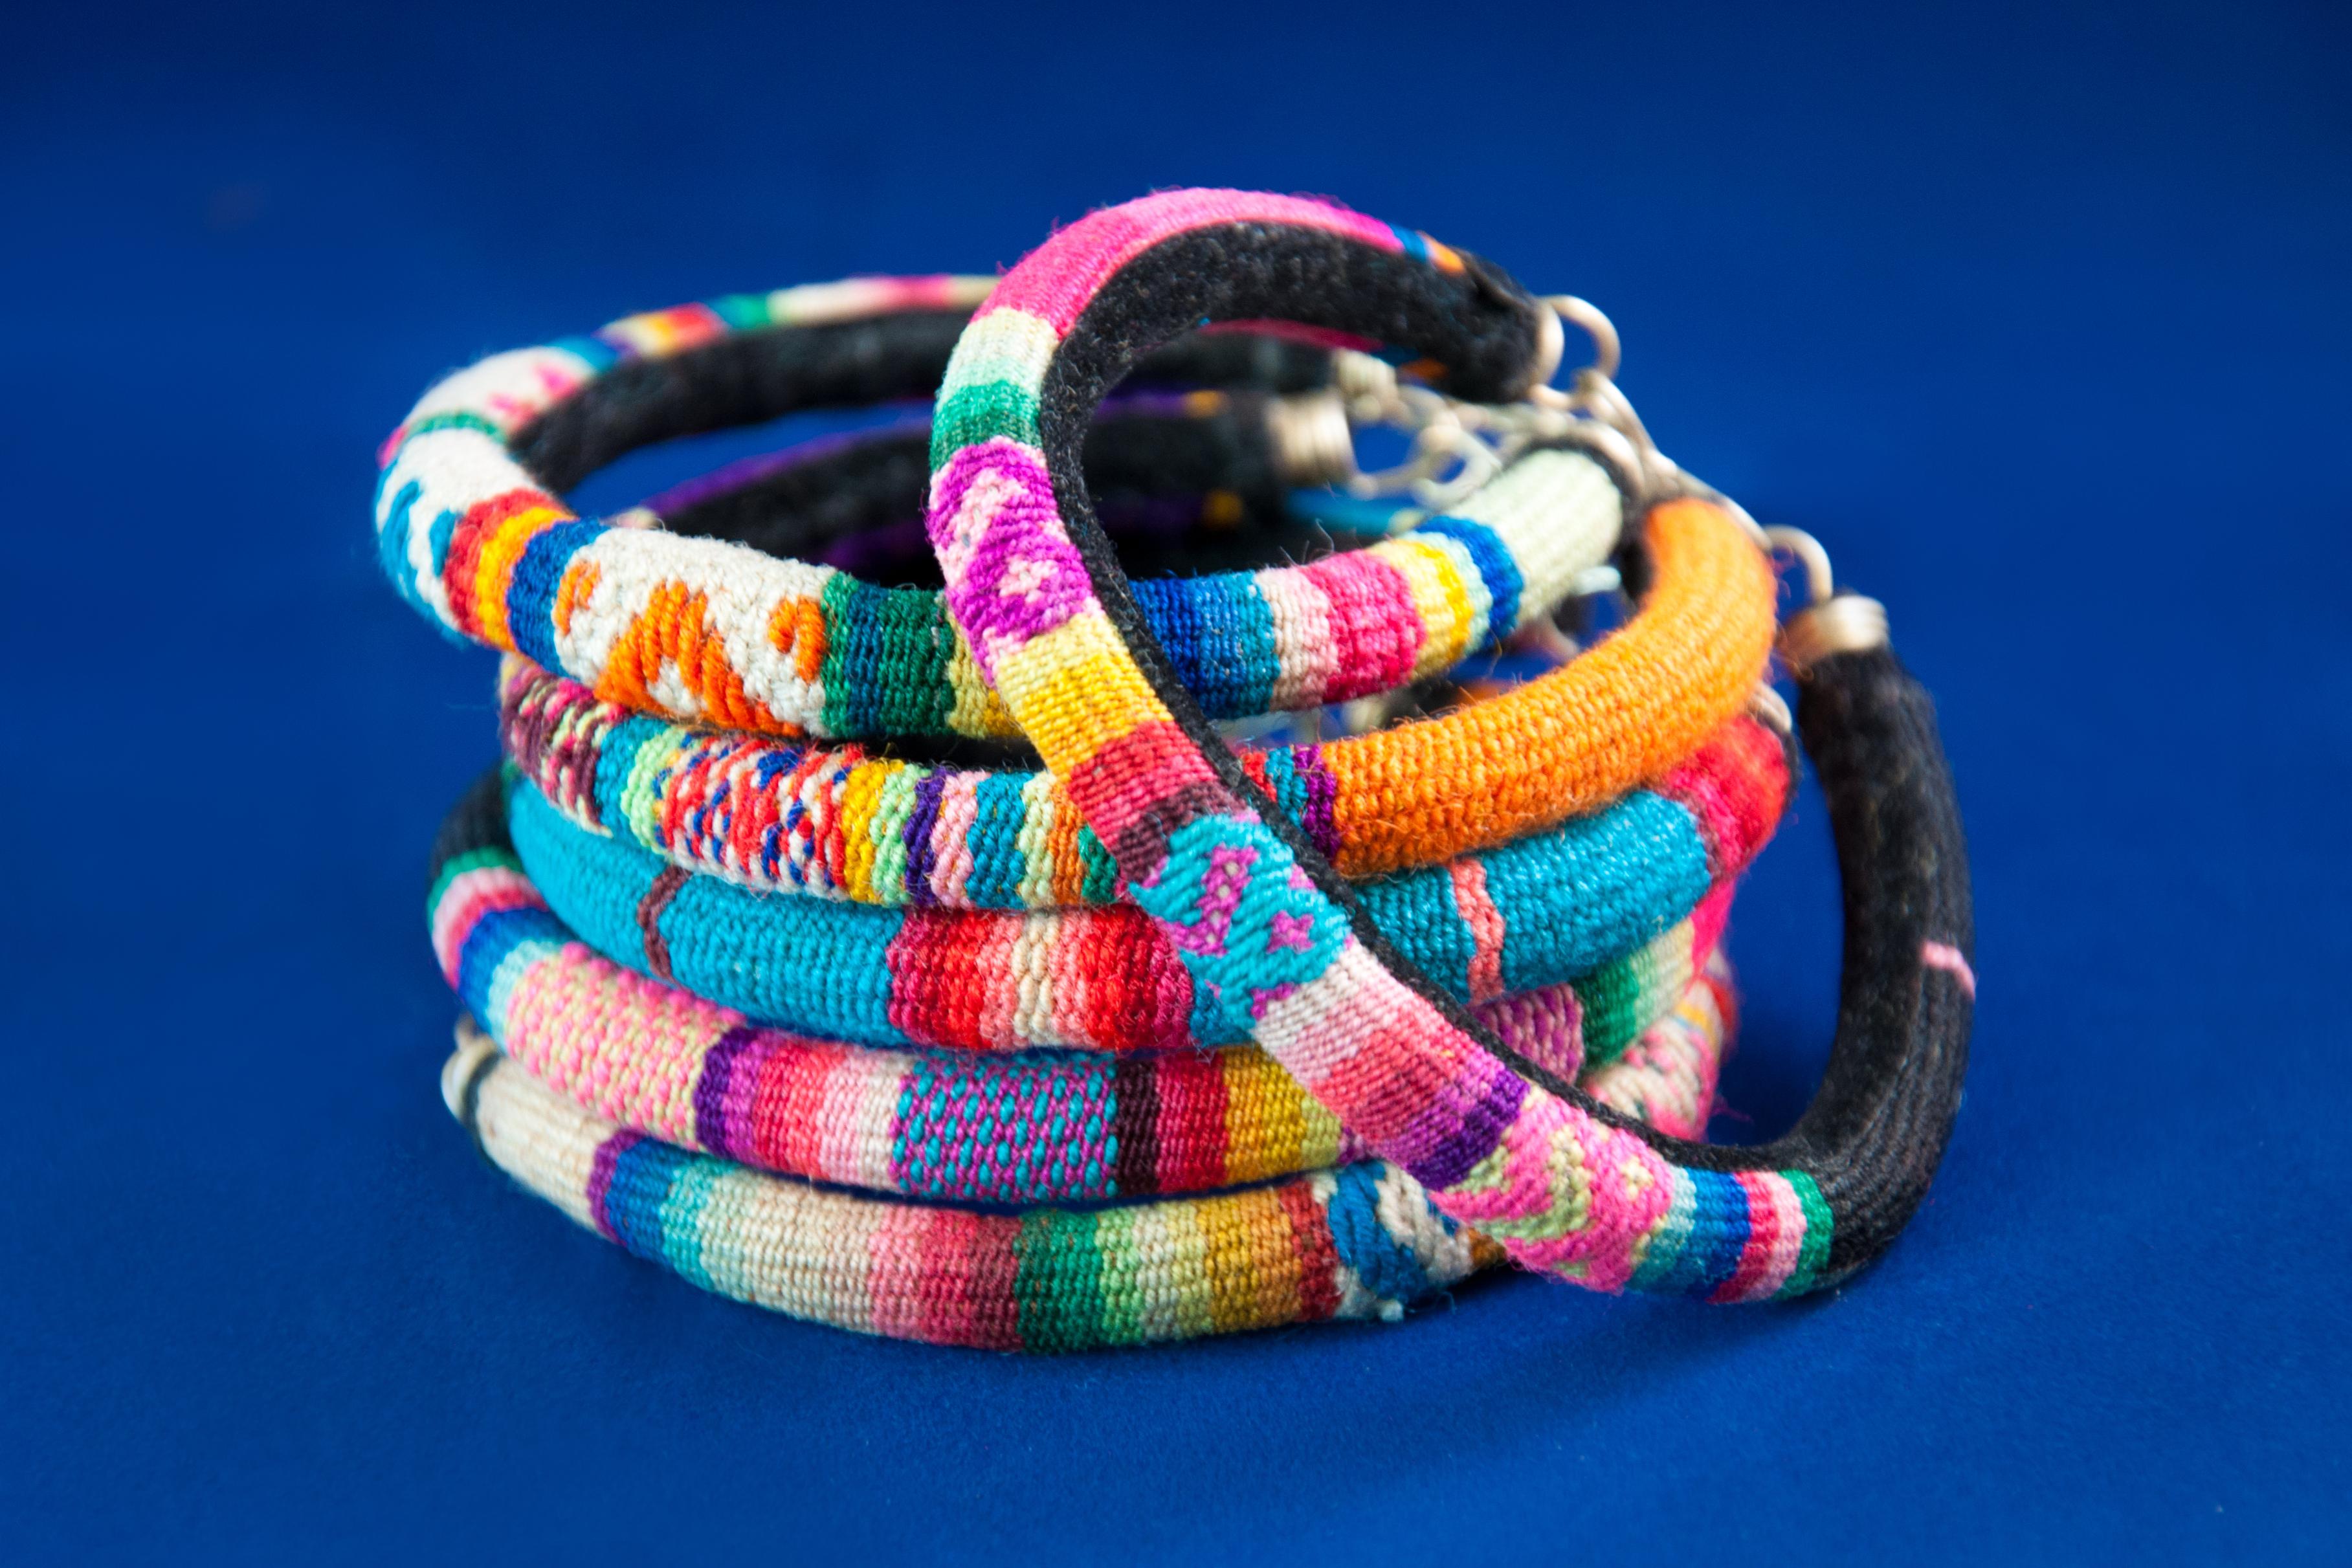 colorful fashion bracelets jewelry, Sexy, Many, Necklace, Objects, HQ Photo